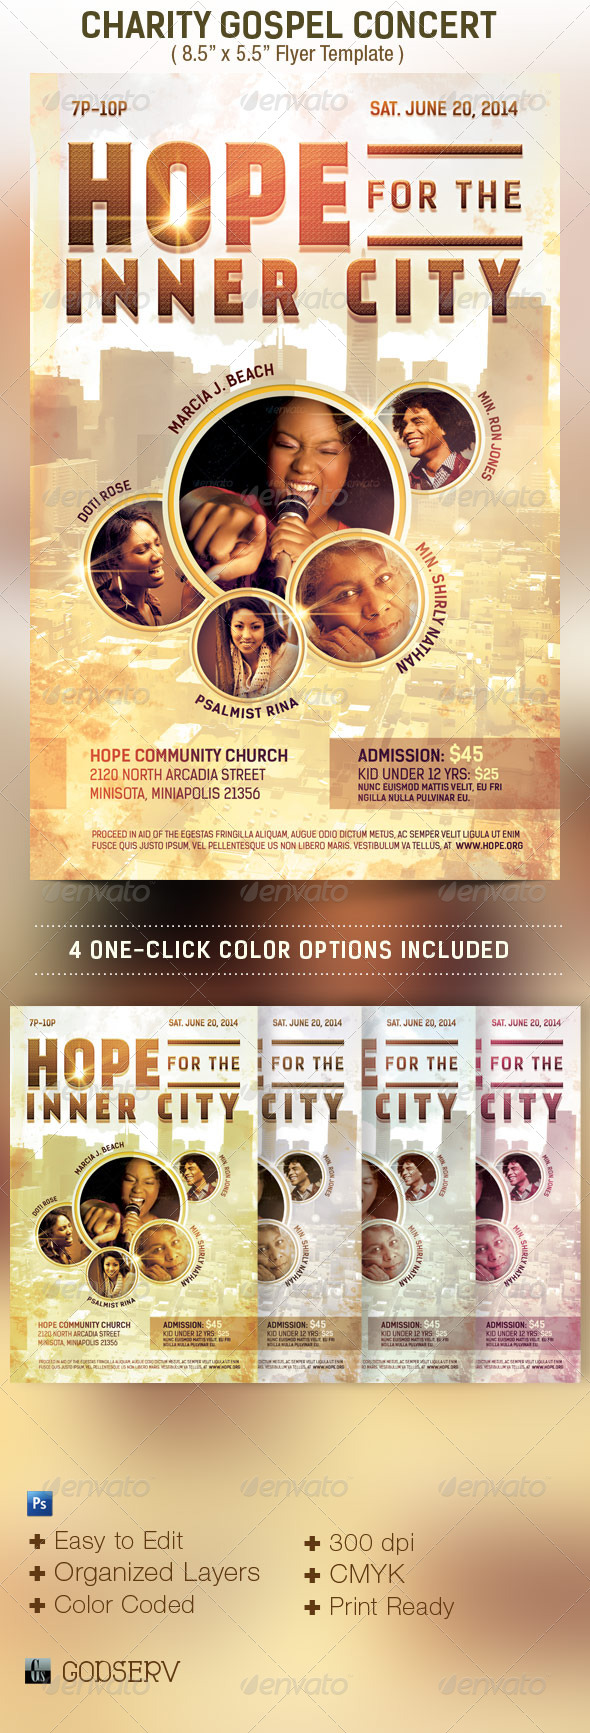 Gospel Concert Flyer Template Free Psd